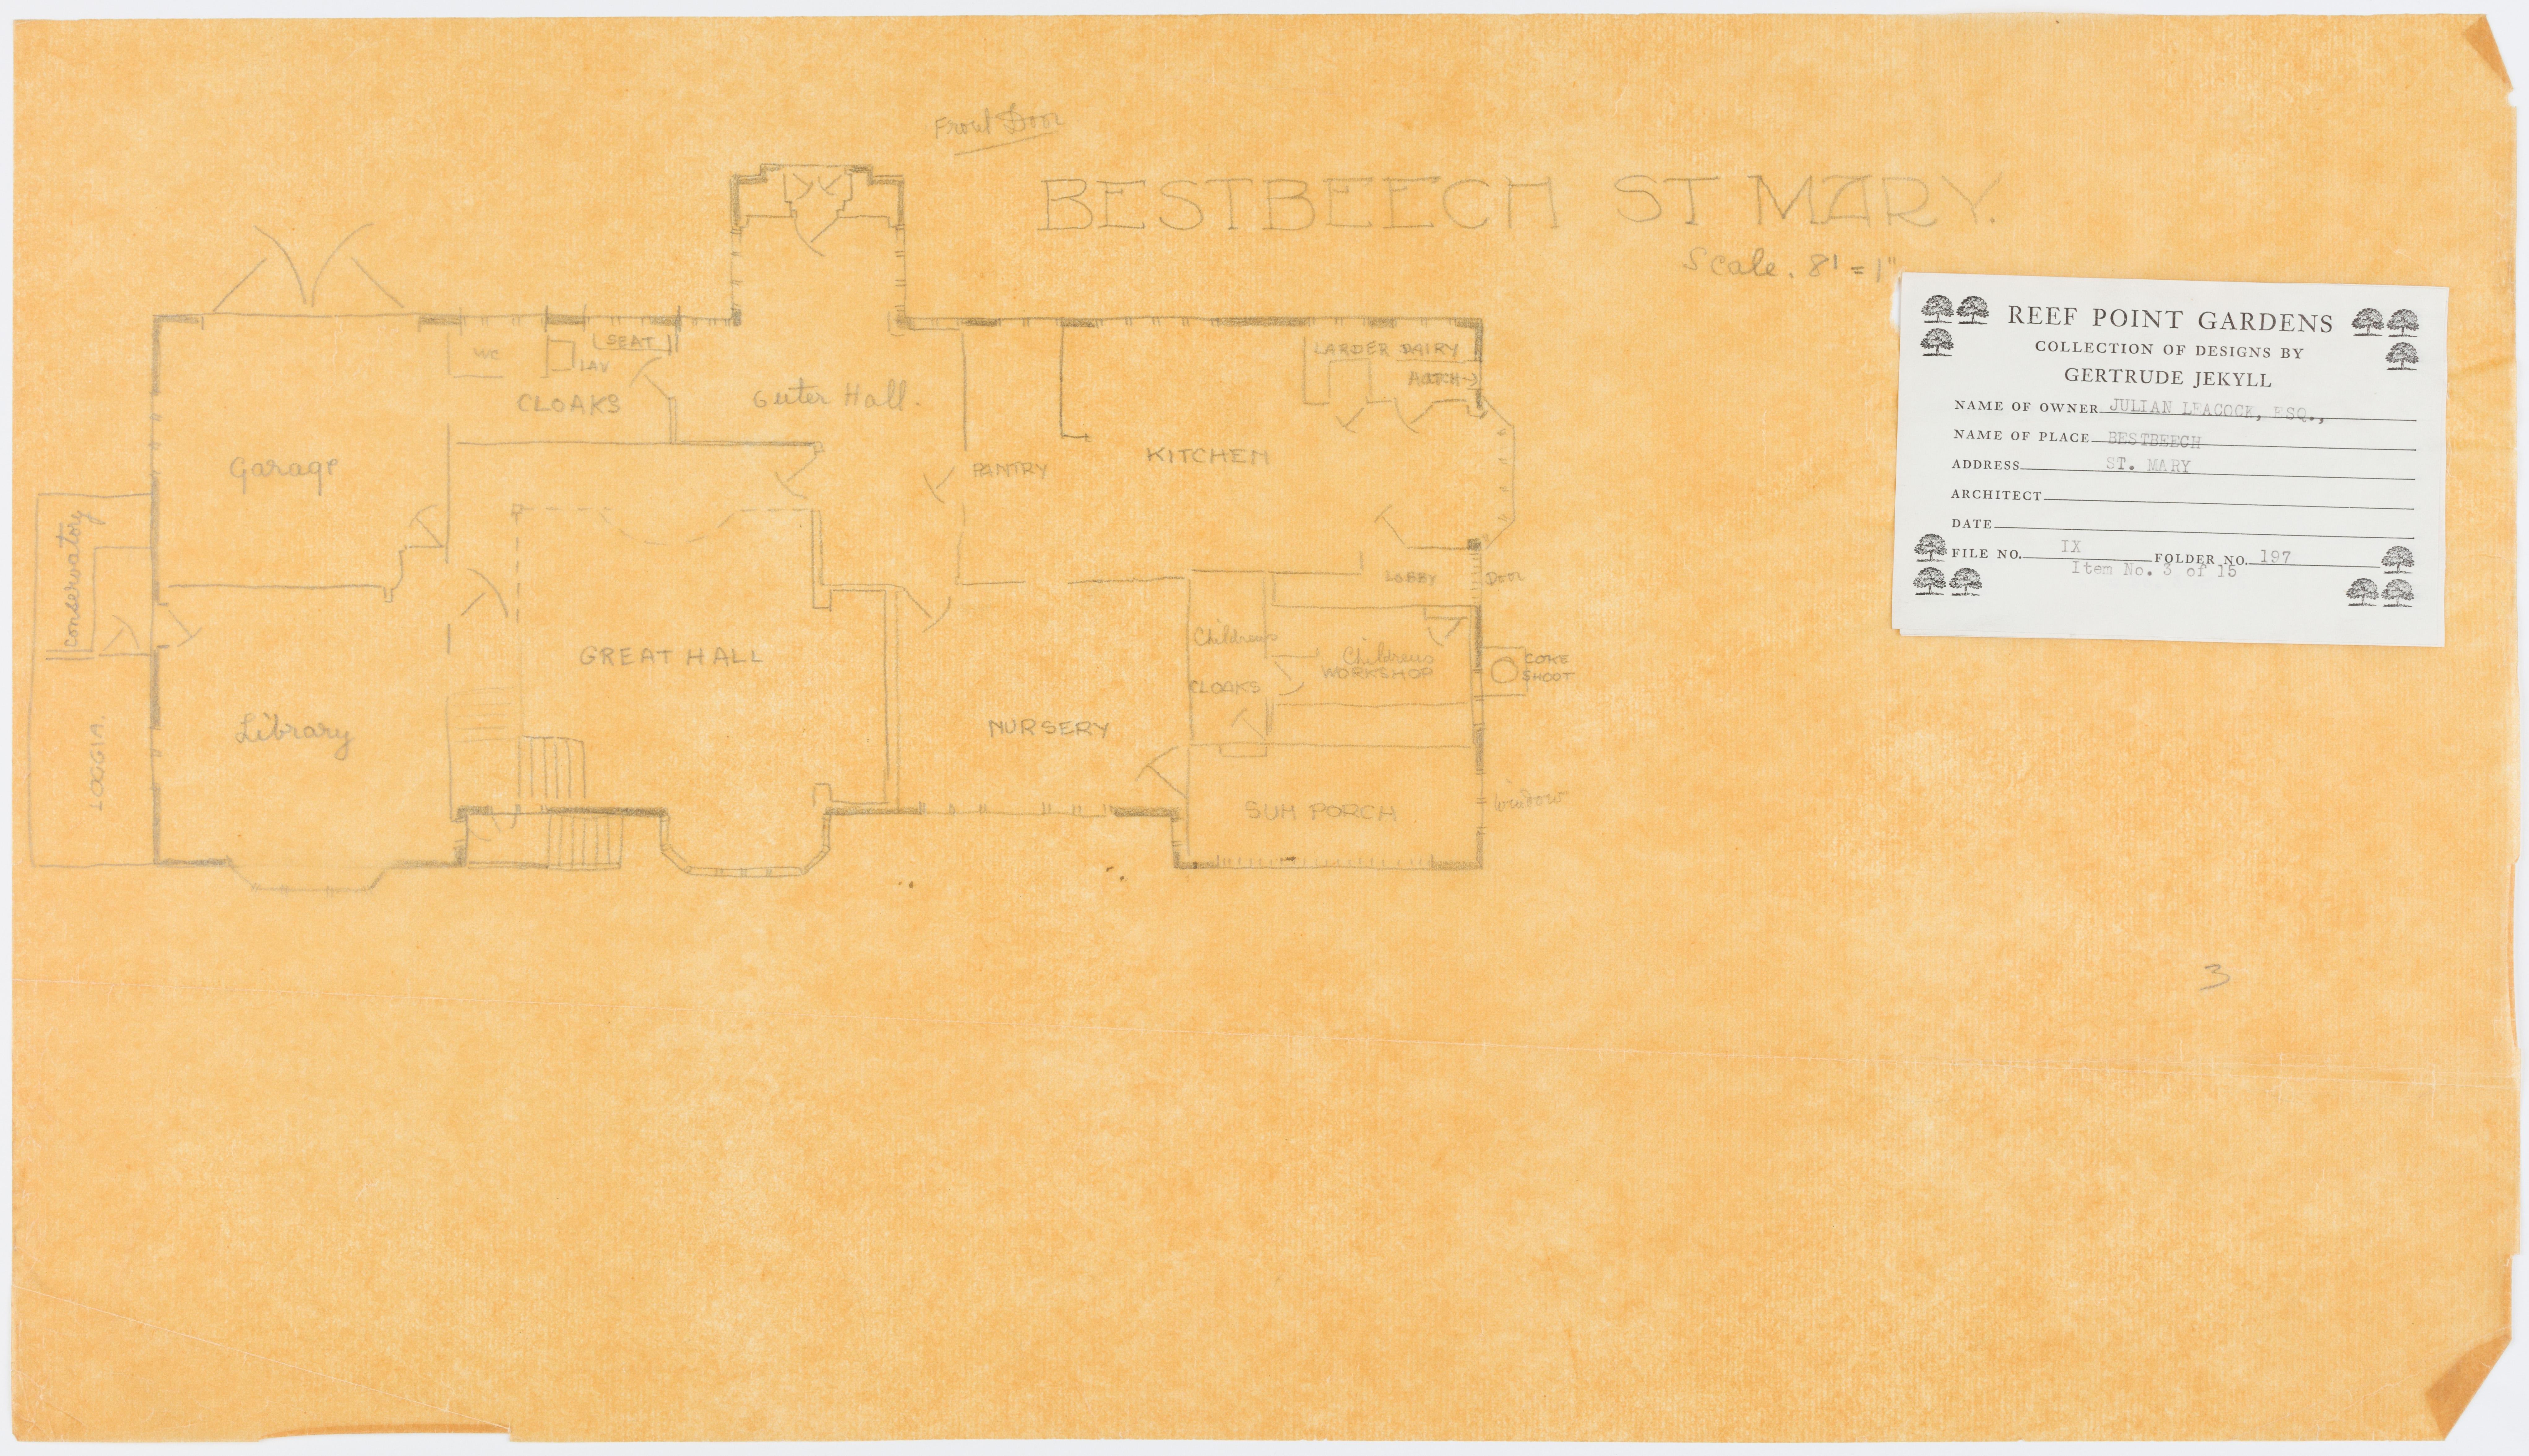 Floor plan of Bestbeech St Mary, c. 1927, Harold Turner, Architect